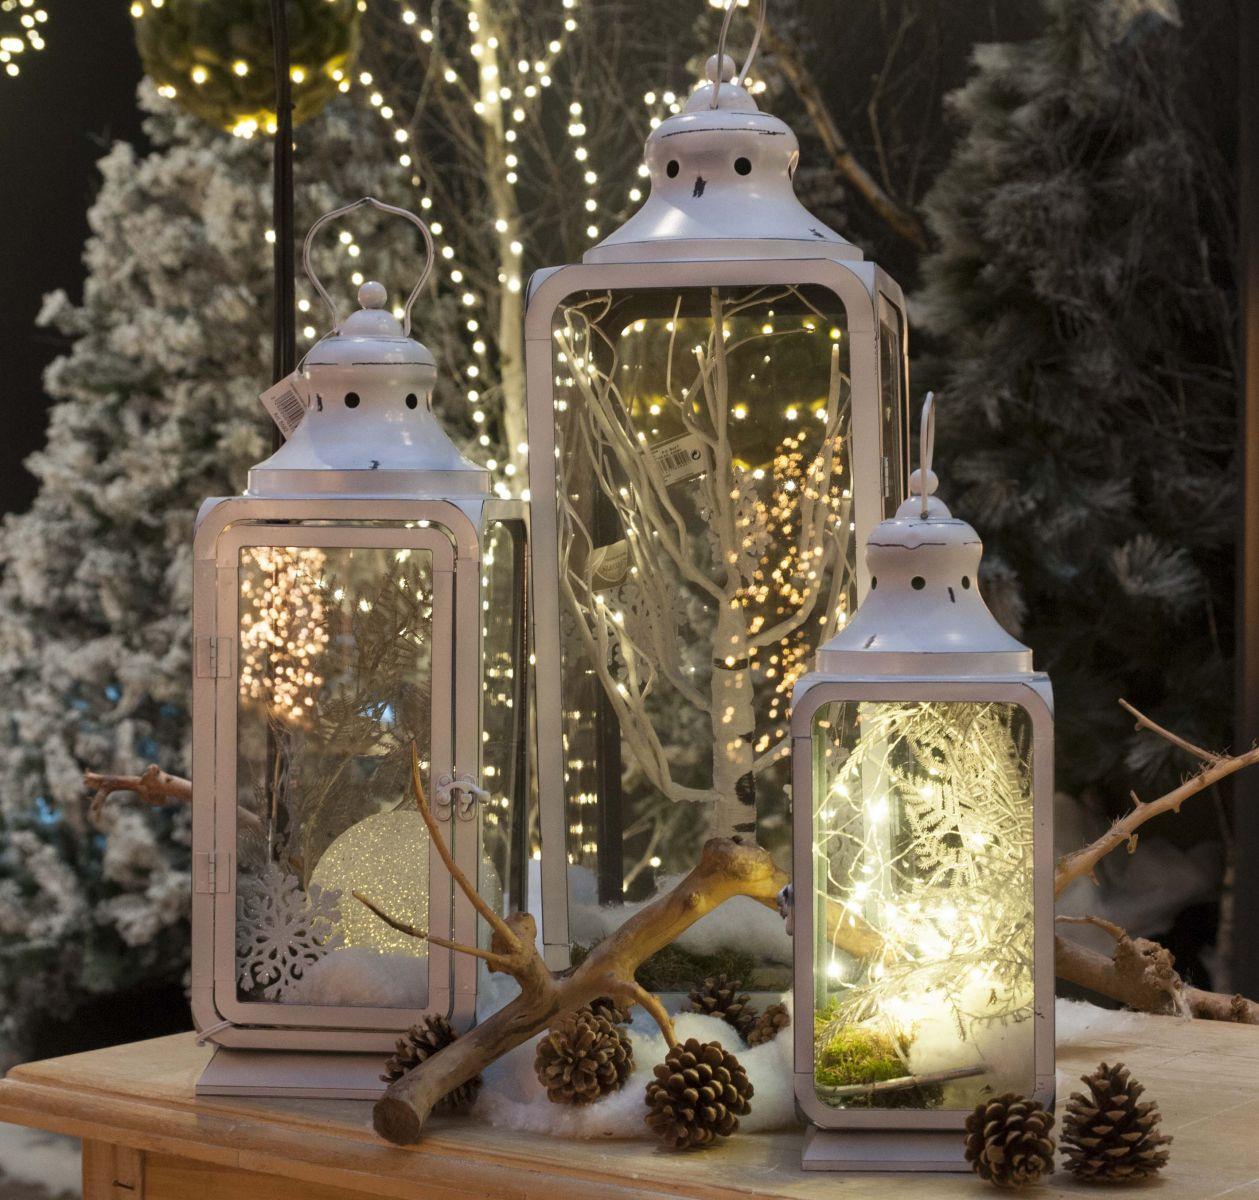 leukste kerstshows van Nederland